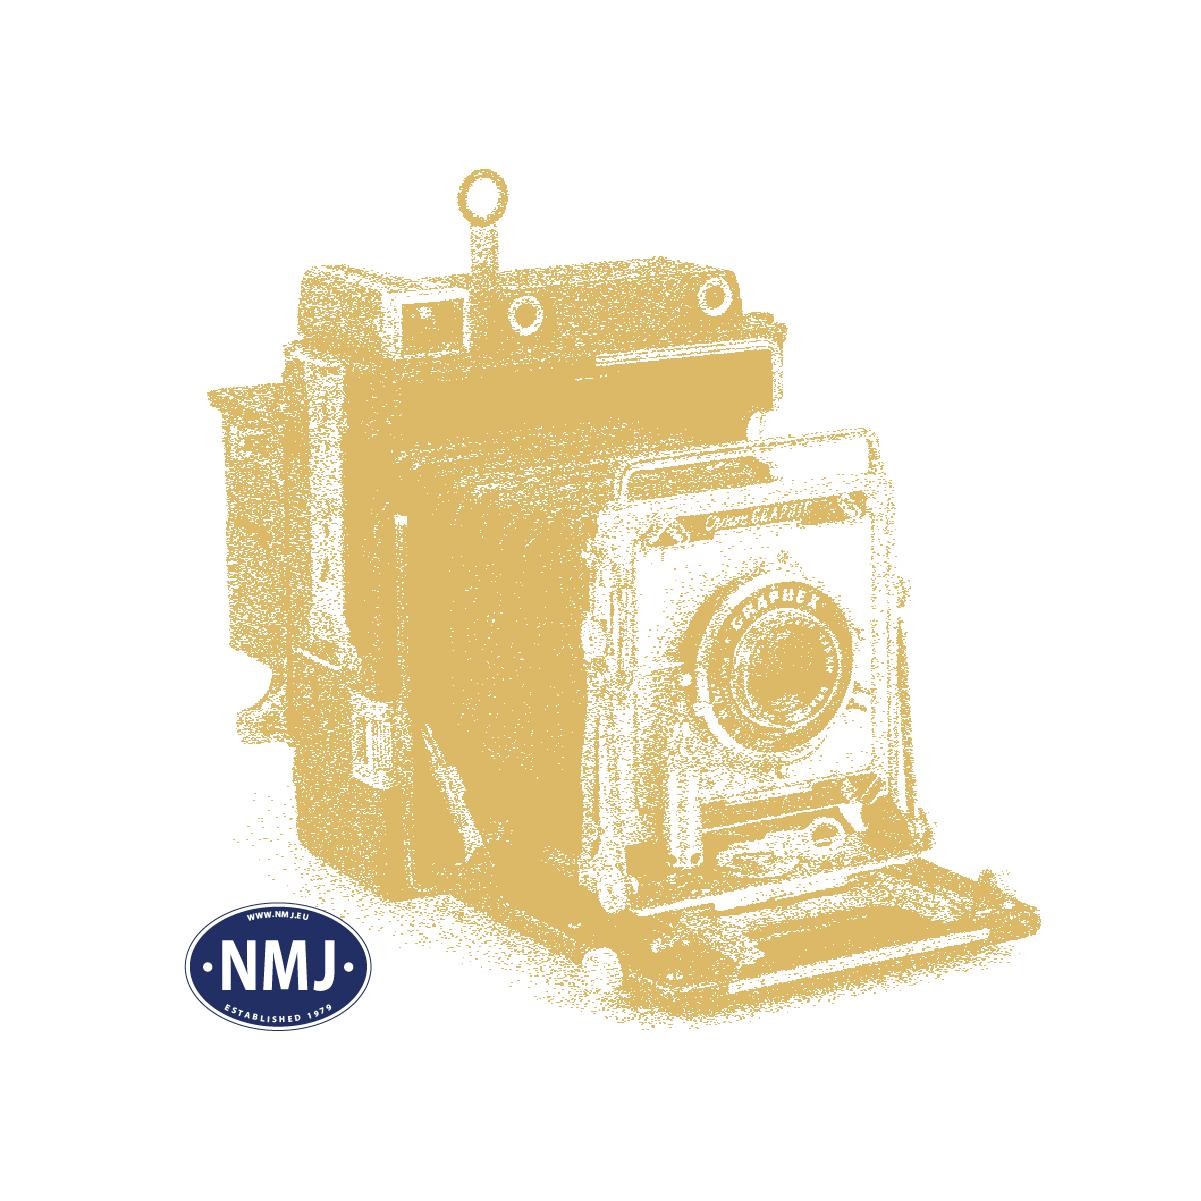 NMJT90302 - NMJ Topline CLF Diesellok 1603 (1956-1971), DCC m/ Sound